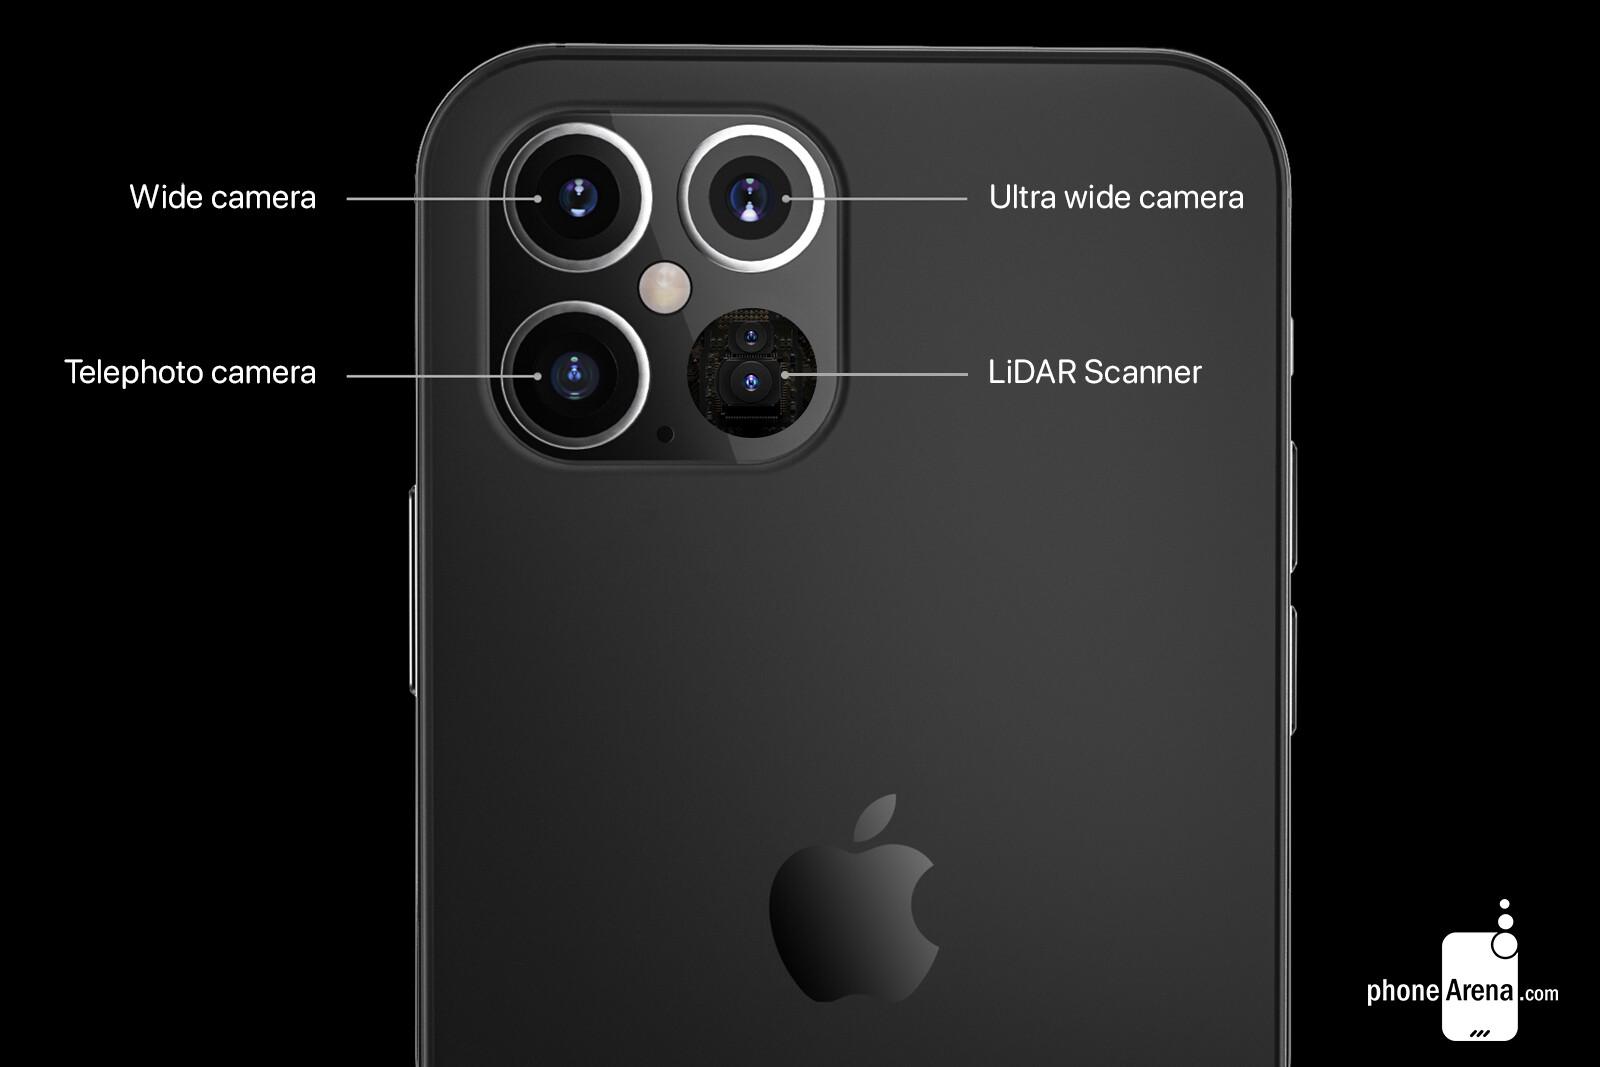 Apple S 2020 Iphone 12 Lineup Pictured In Beautiful Design Renders Phonearena